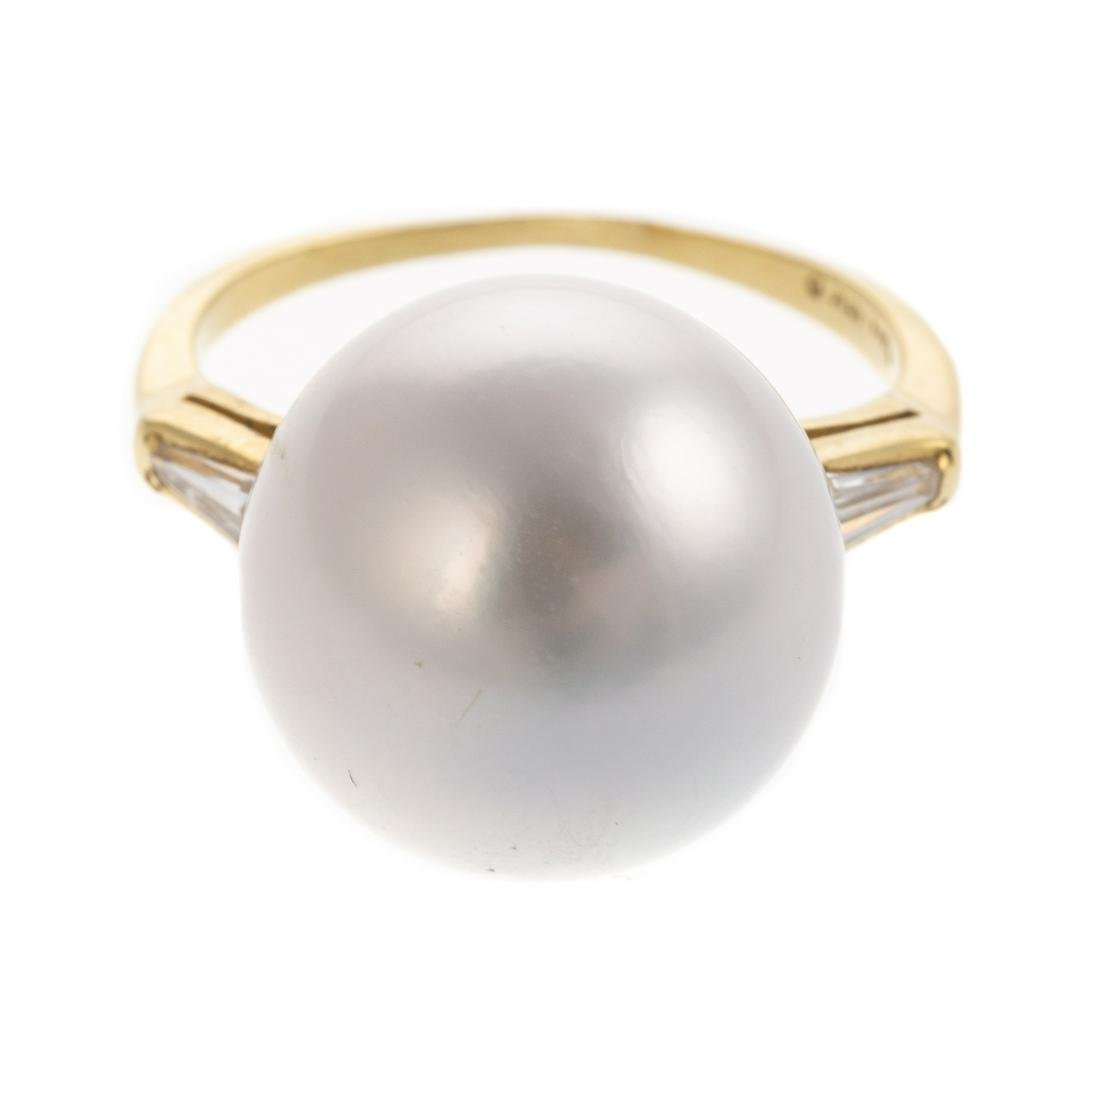 A Ladies South Sea Pearl & Diamond Ring in 18K